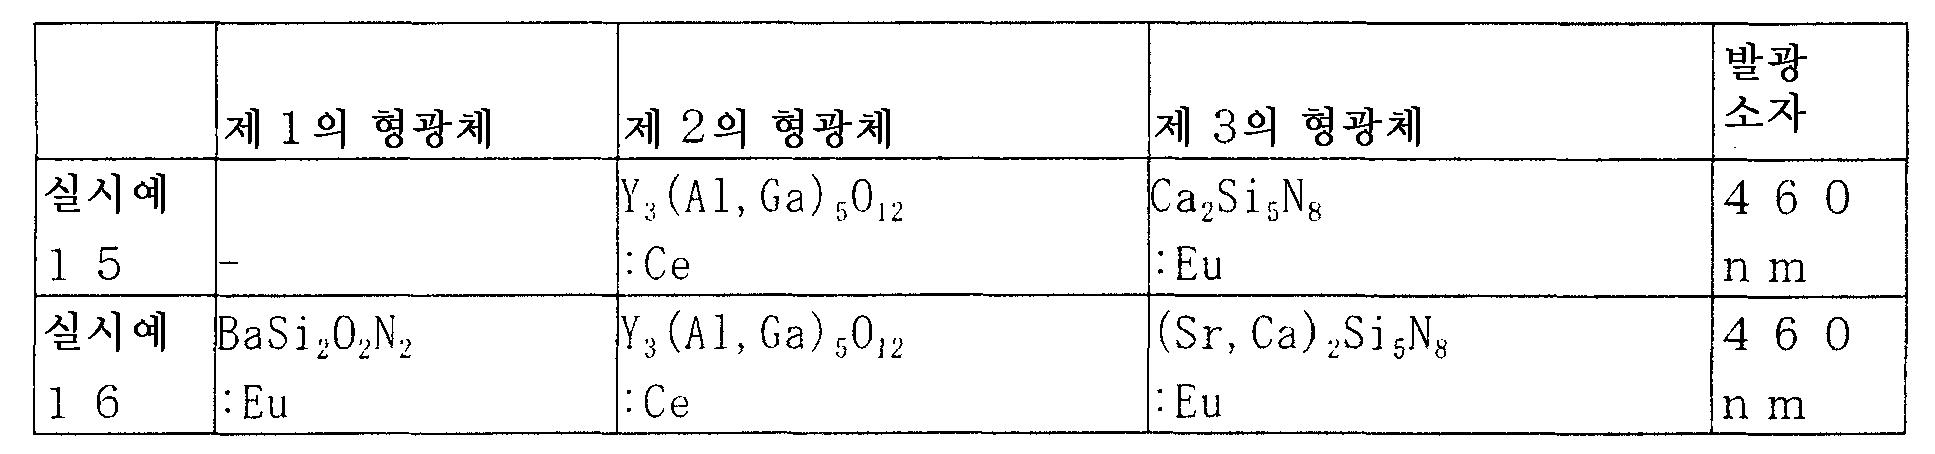 Figure 112006018872163-pct00029